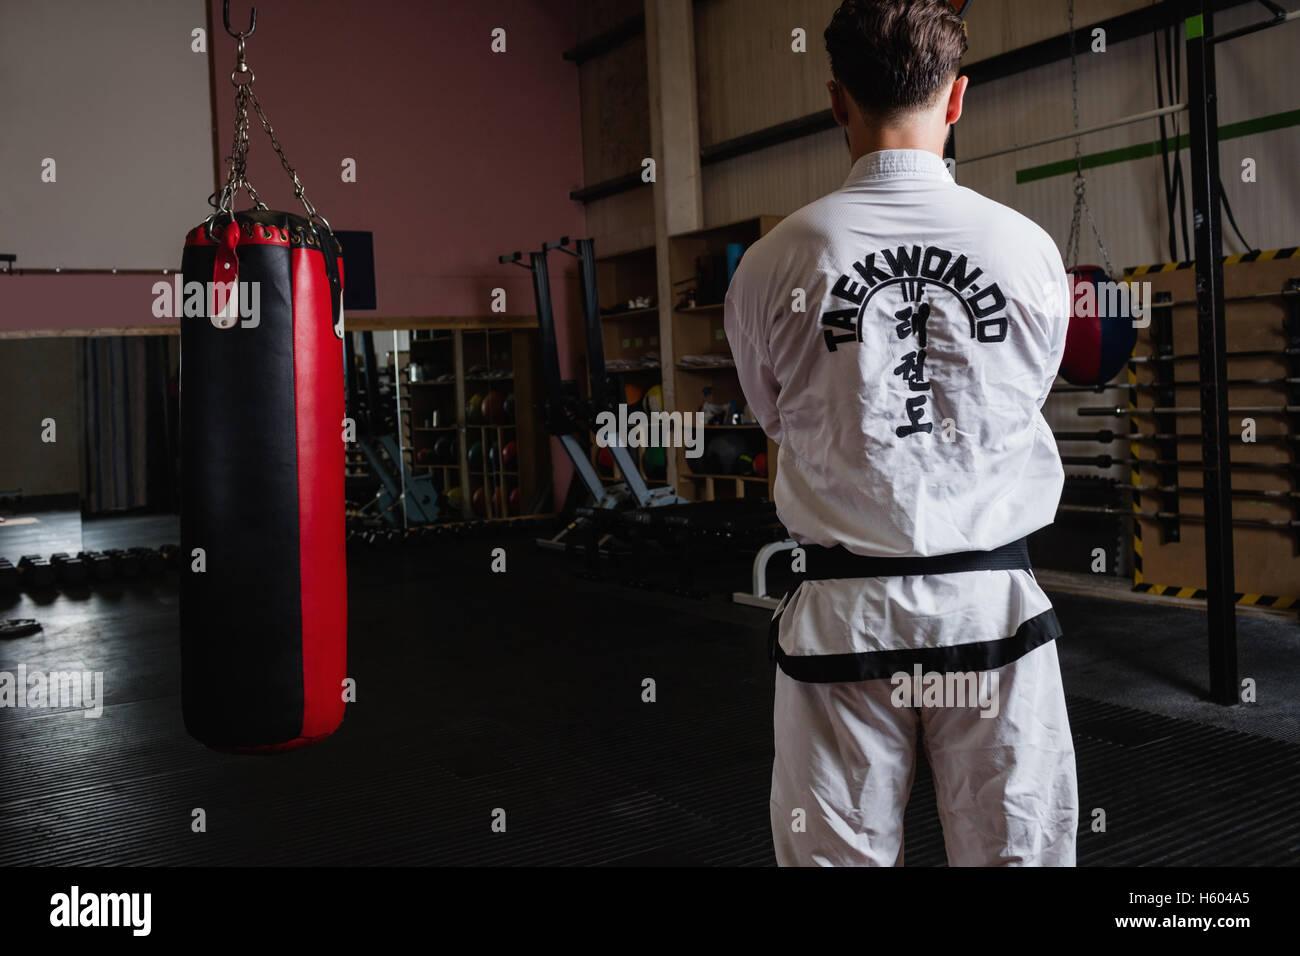 Rear view of man standing beside punching bag - Stock Image